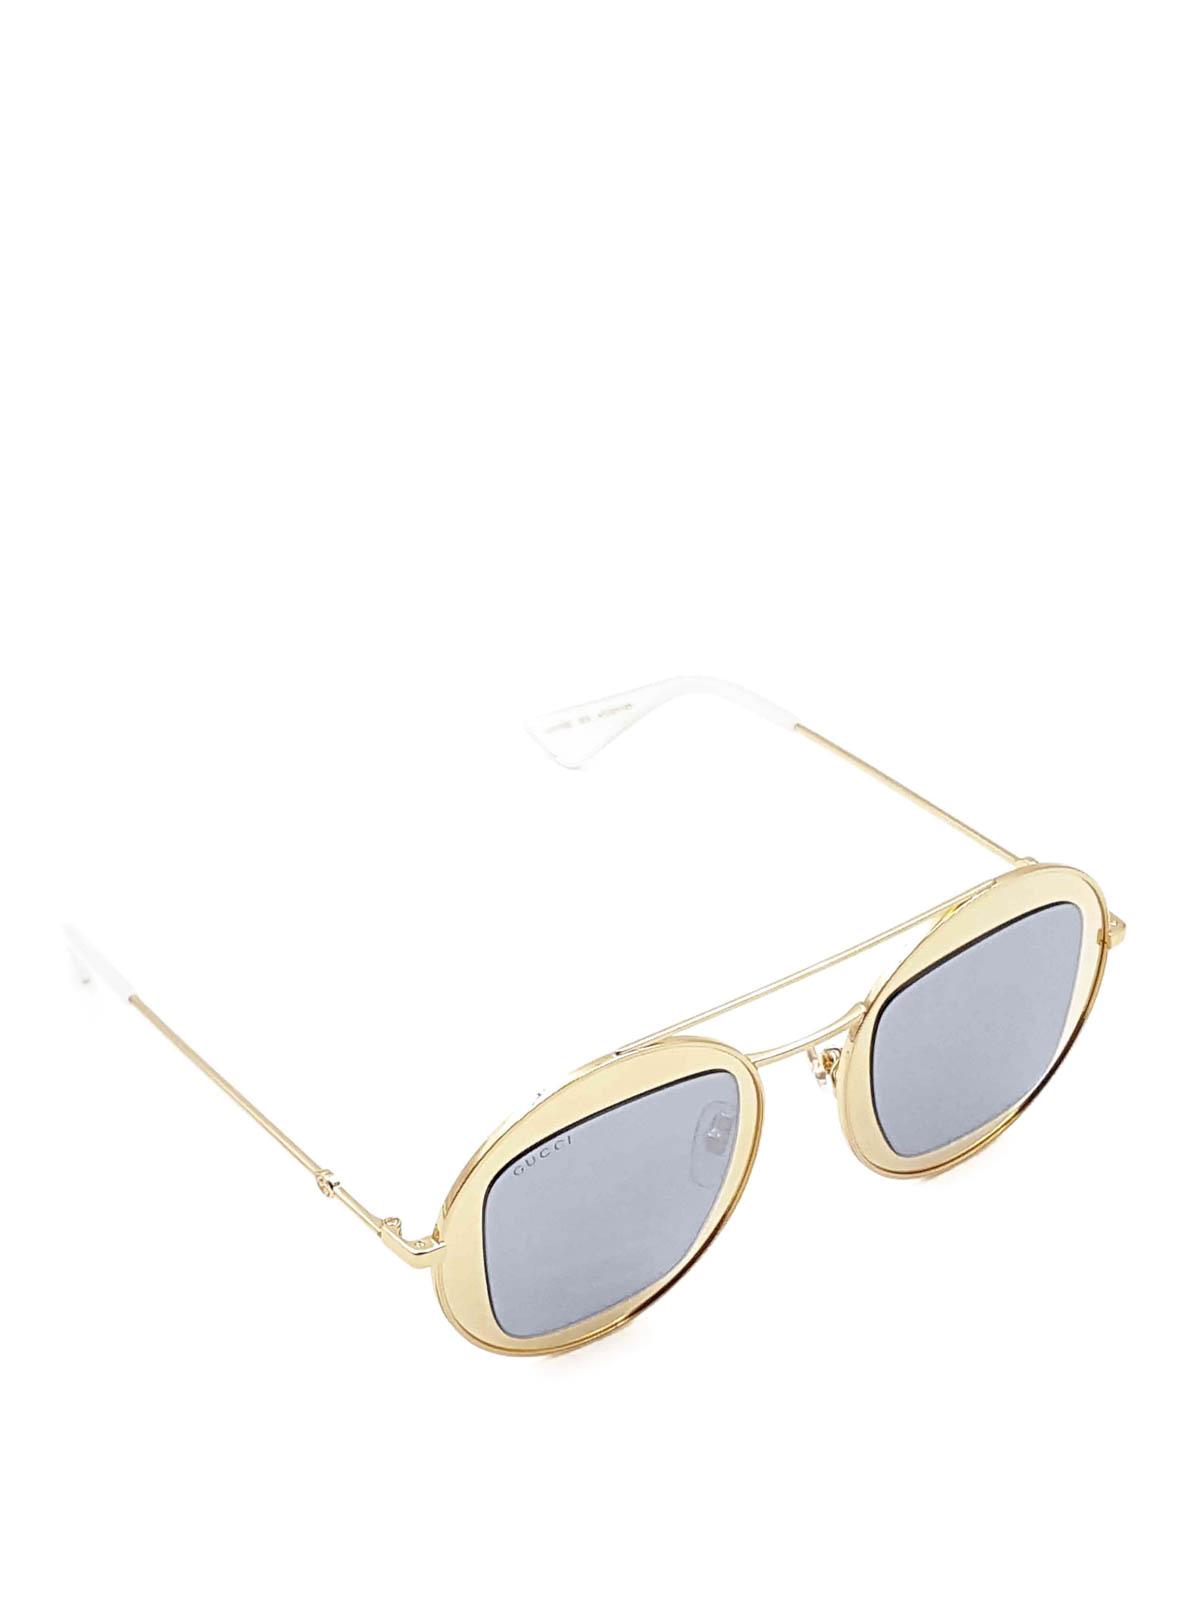 b5f1680199b Gucci Sunglasses Round 2018 - Bitterroot Public Library